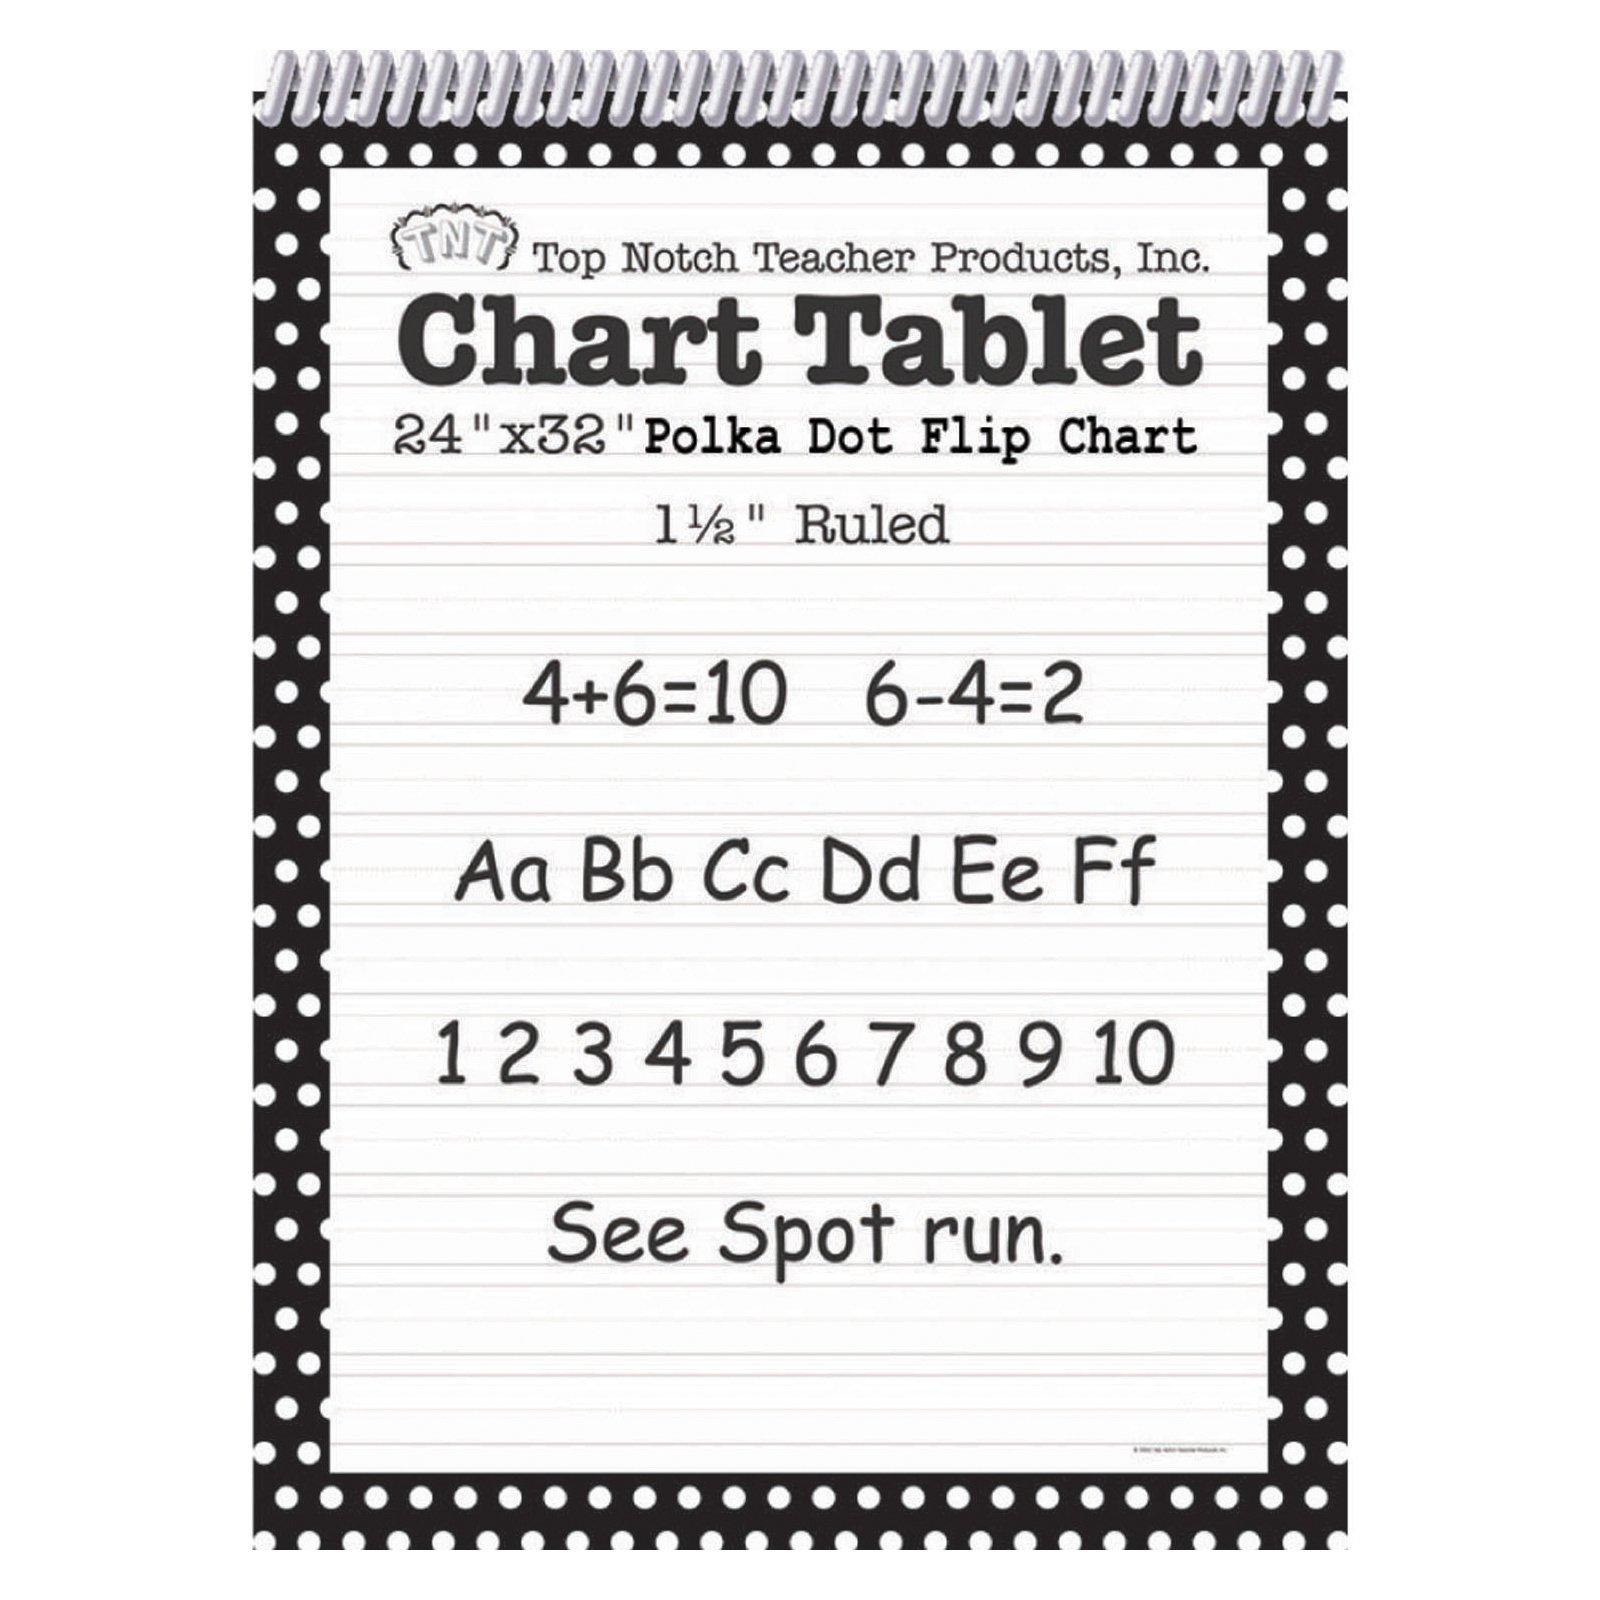 Top Notch Teacher Products Chart Tablet Polka Dot (1 1/2'' Ruled), Black, 24'' x 32''